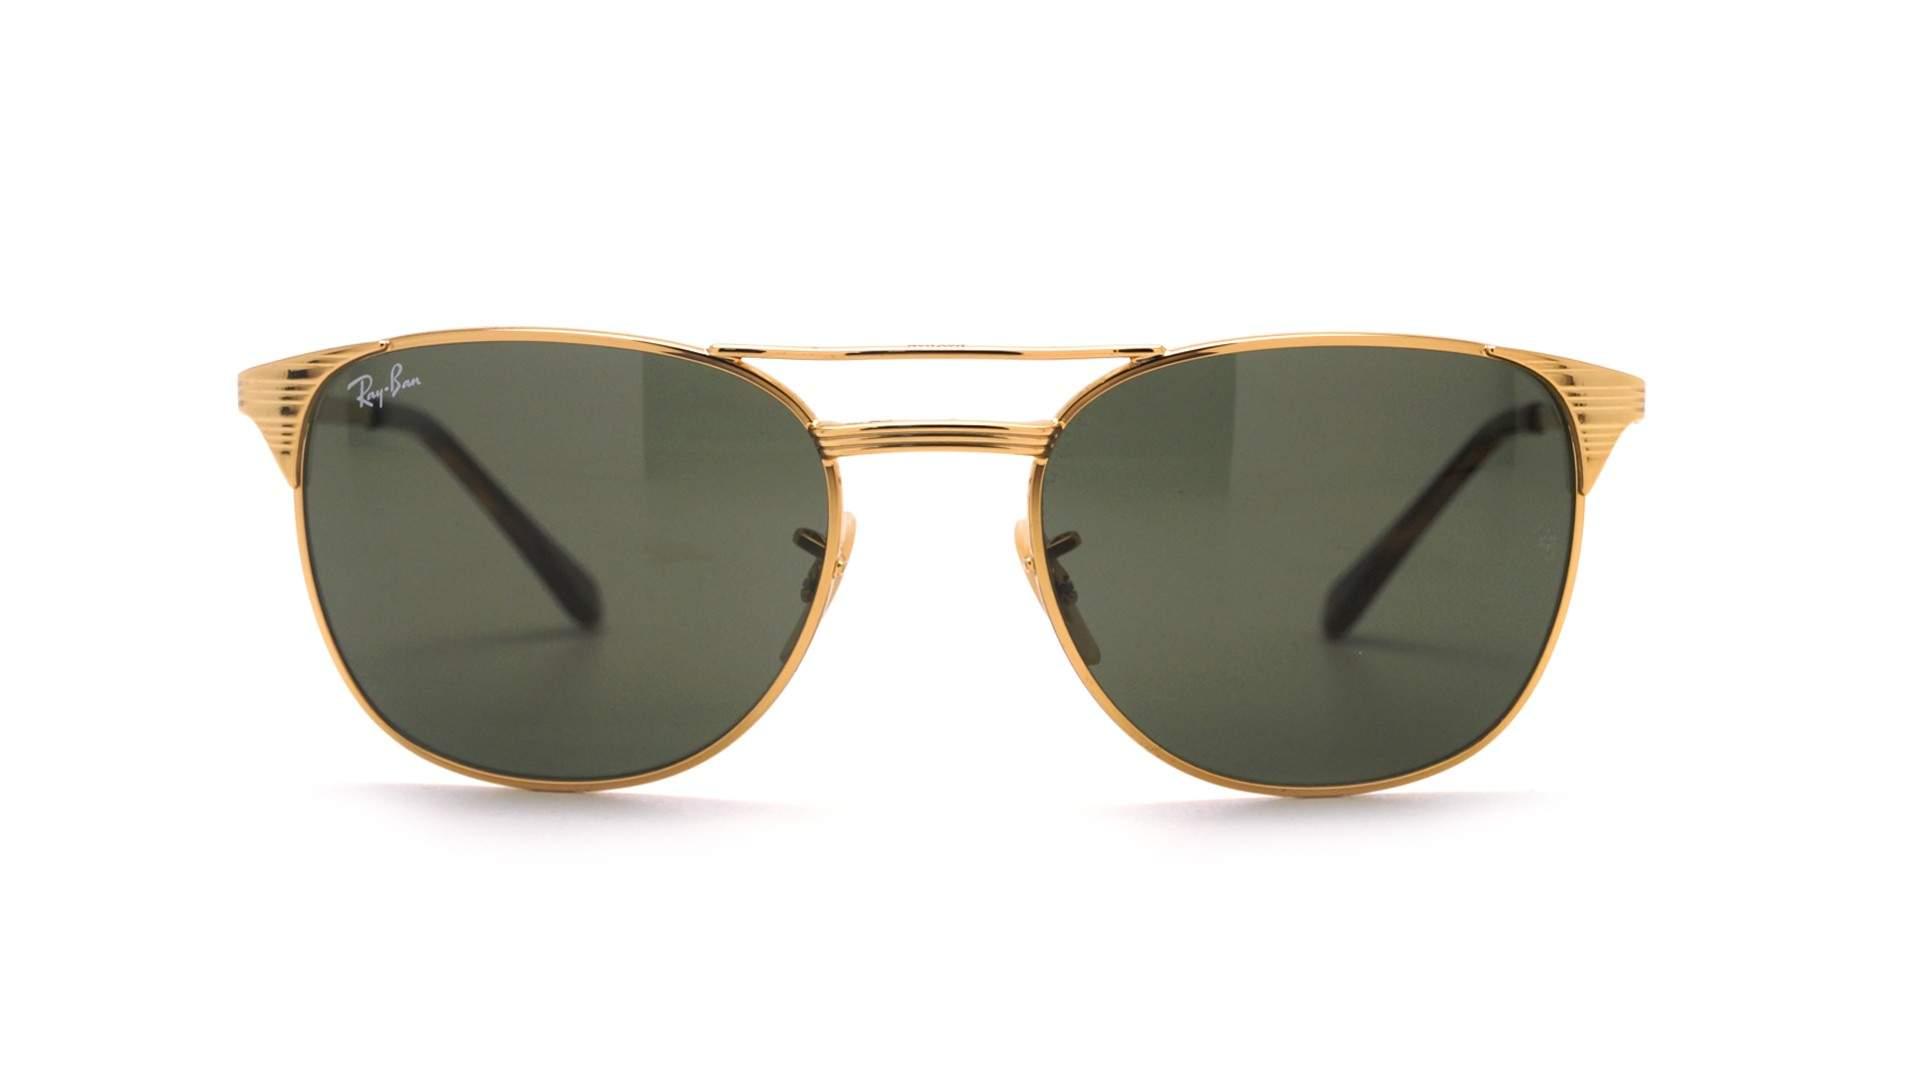 1f868b755cb Sunglasses Ray-Ban Signet Gold G-15 RB3429M 001 58-19 Large